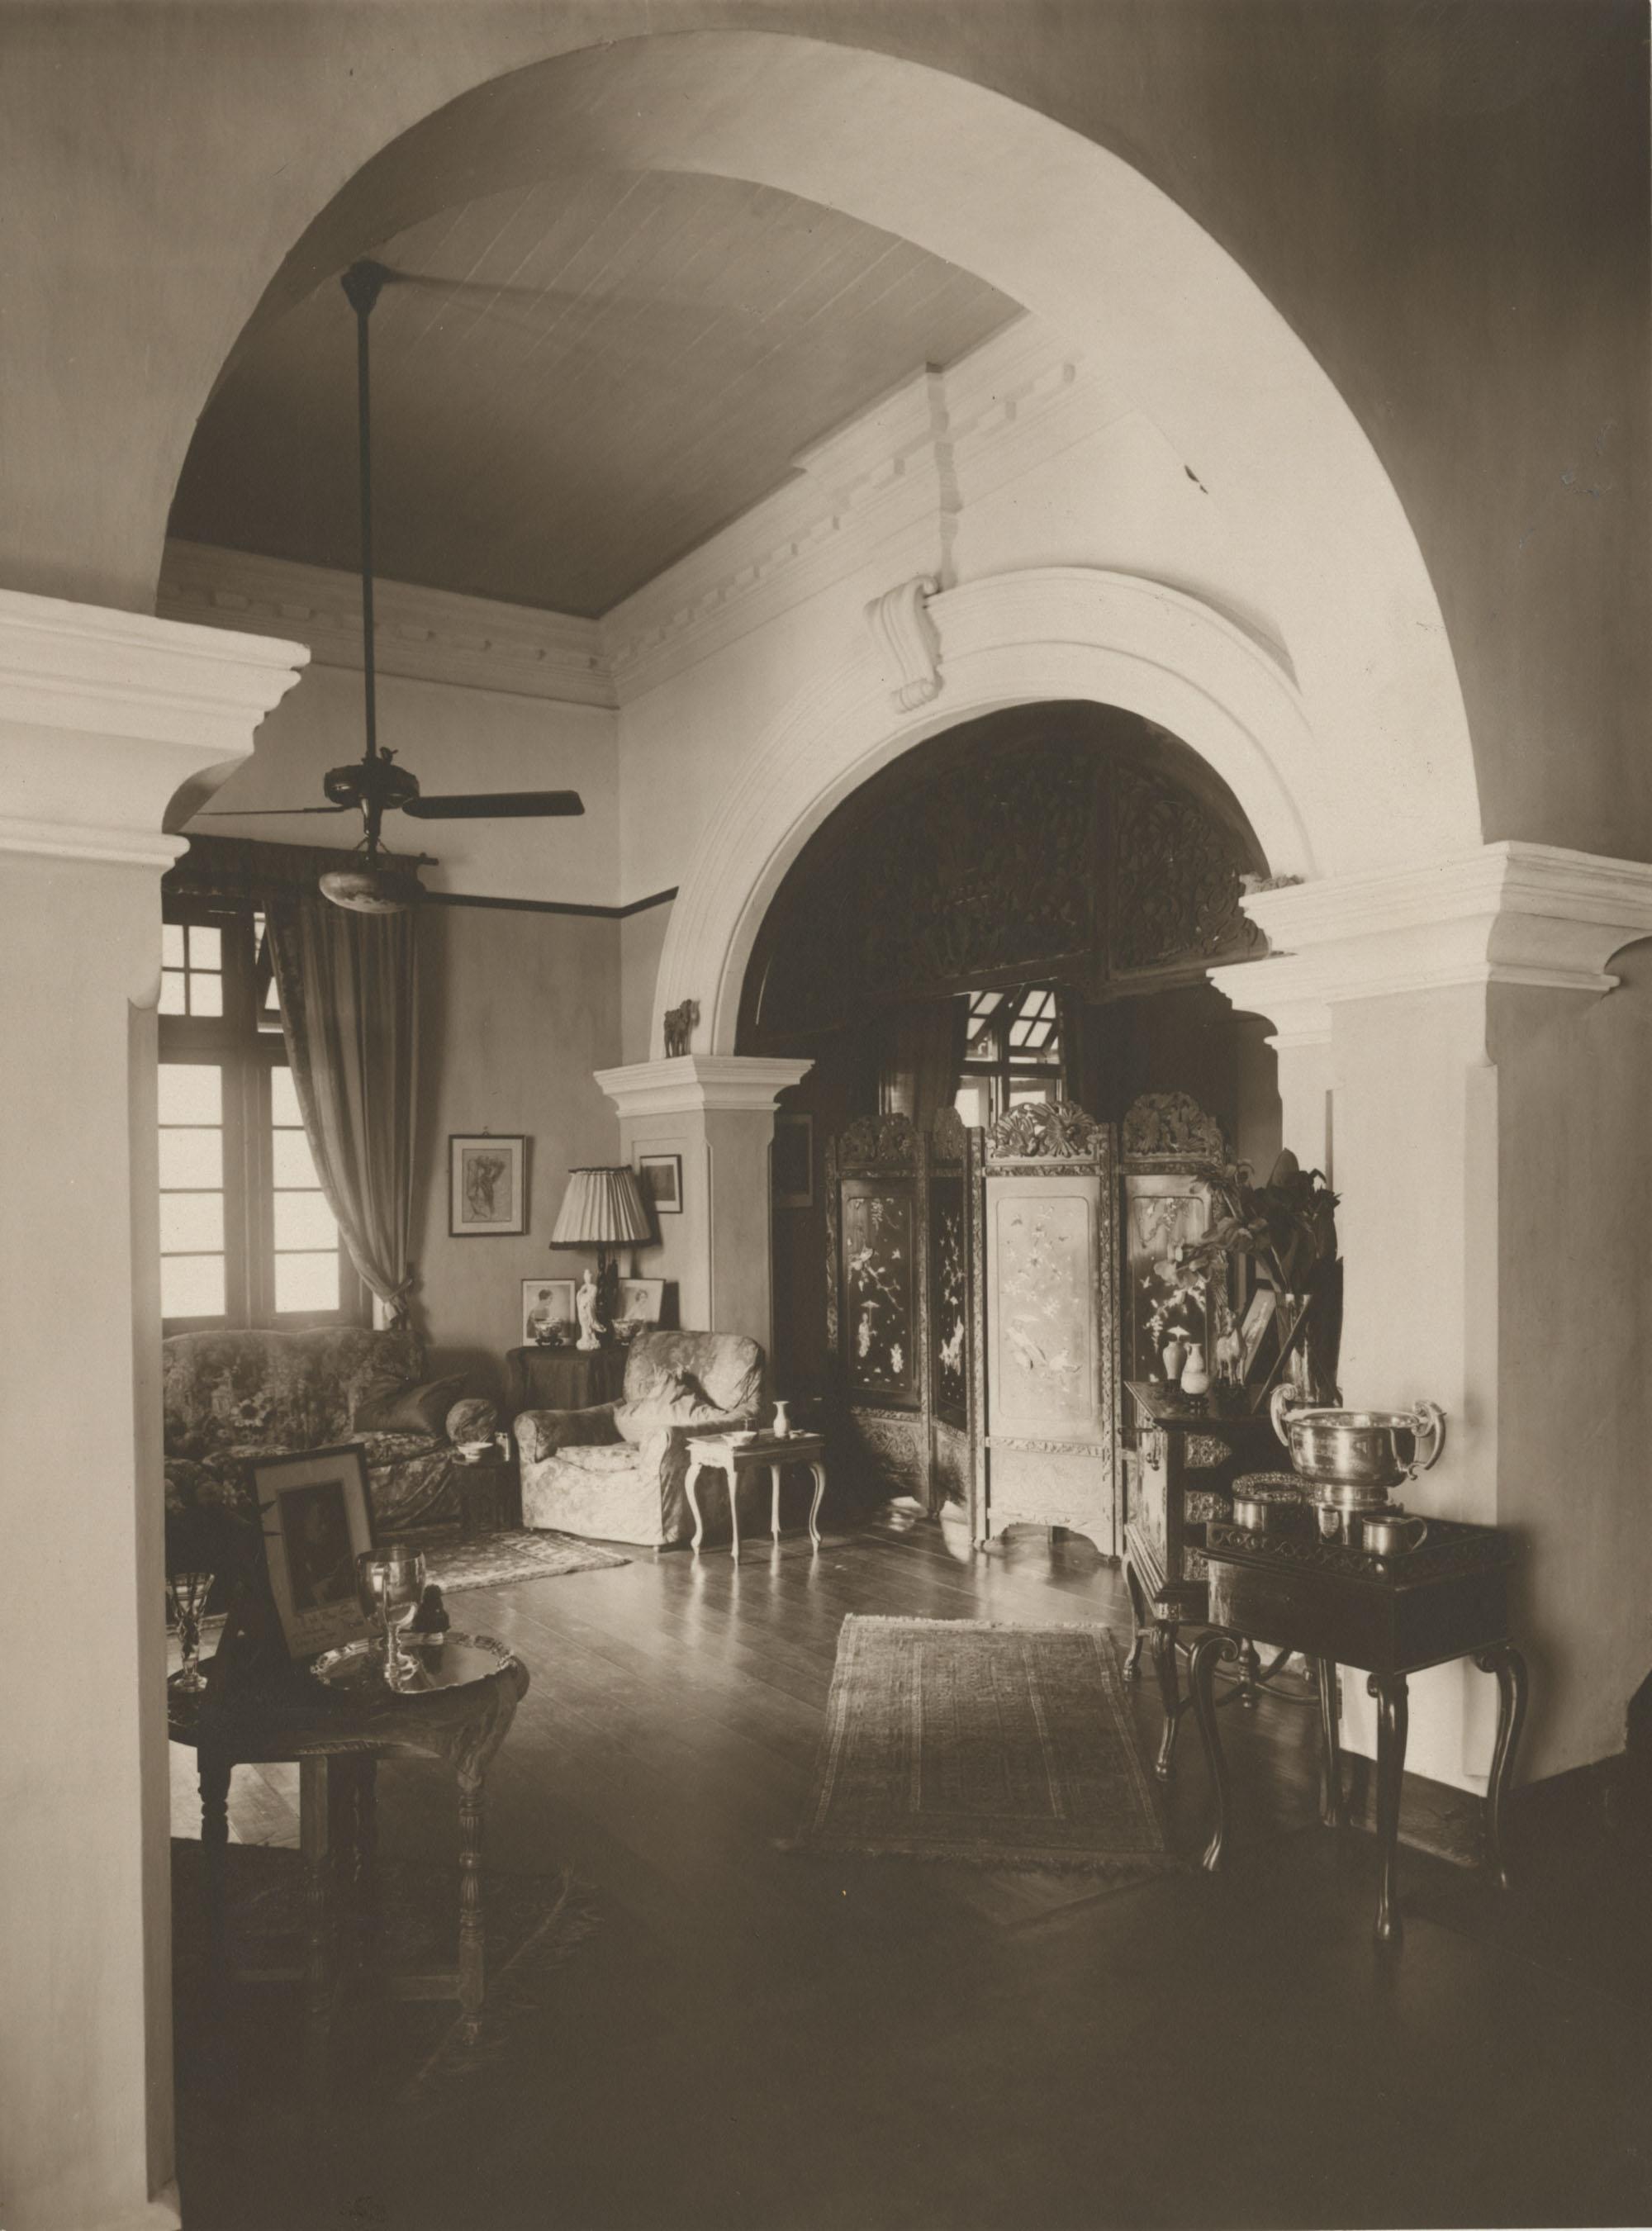 Interior of the Royal Italian Consul in Sri Lanka, Photograph 2